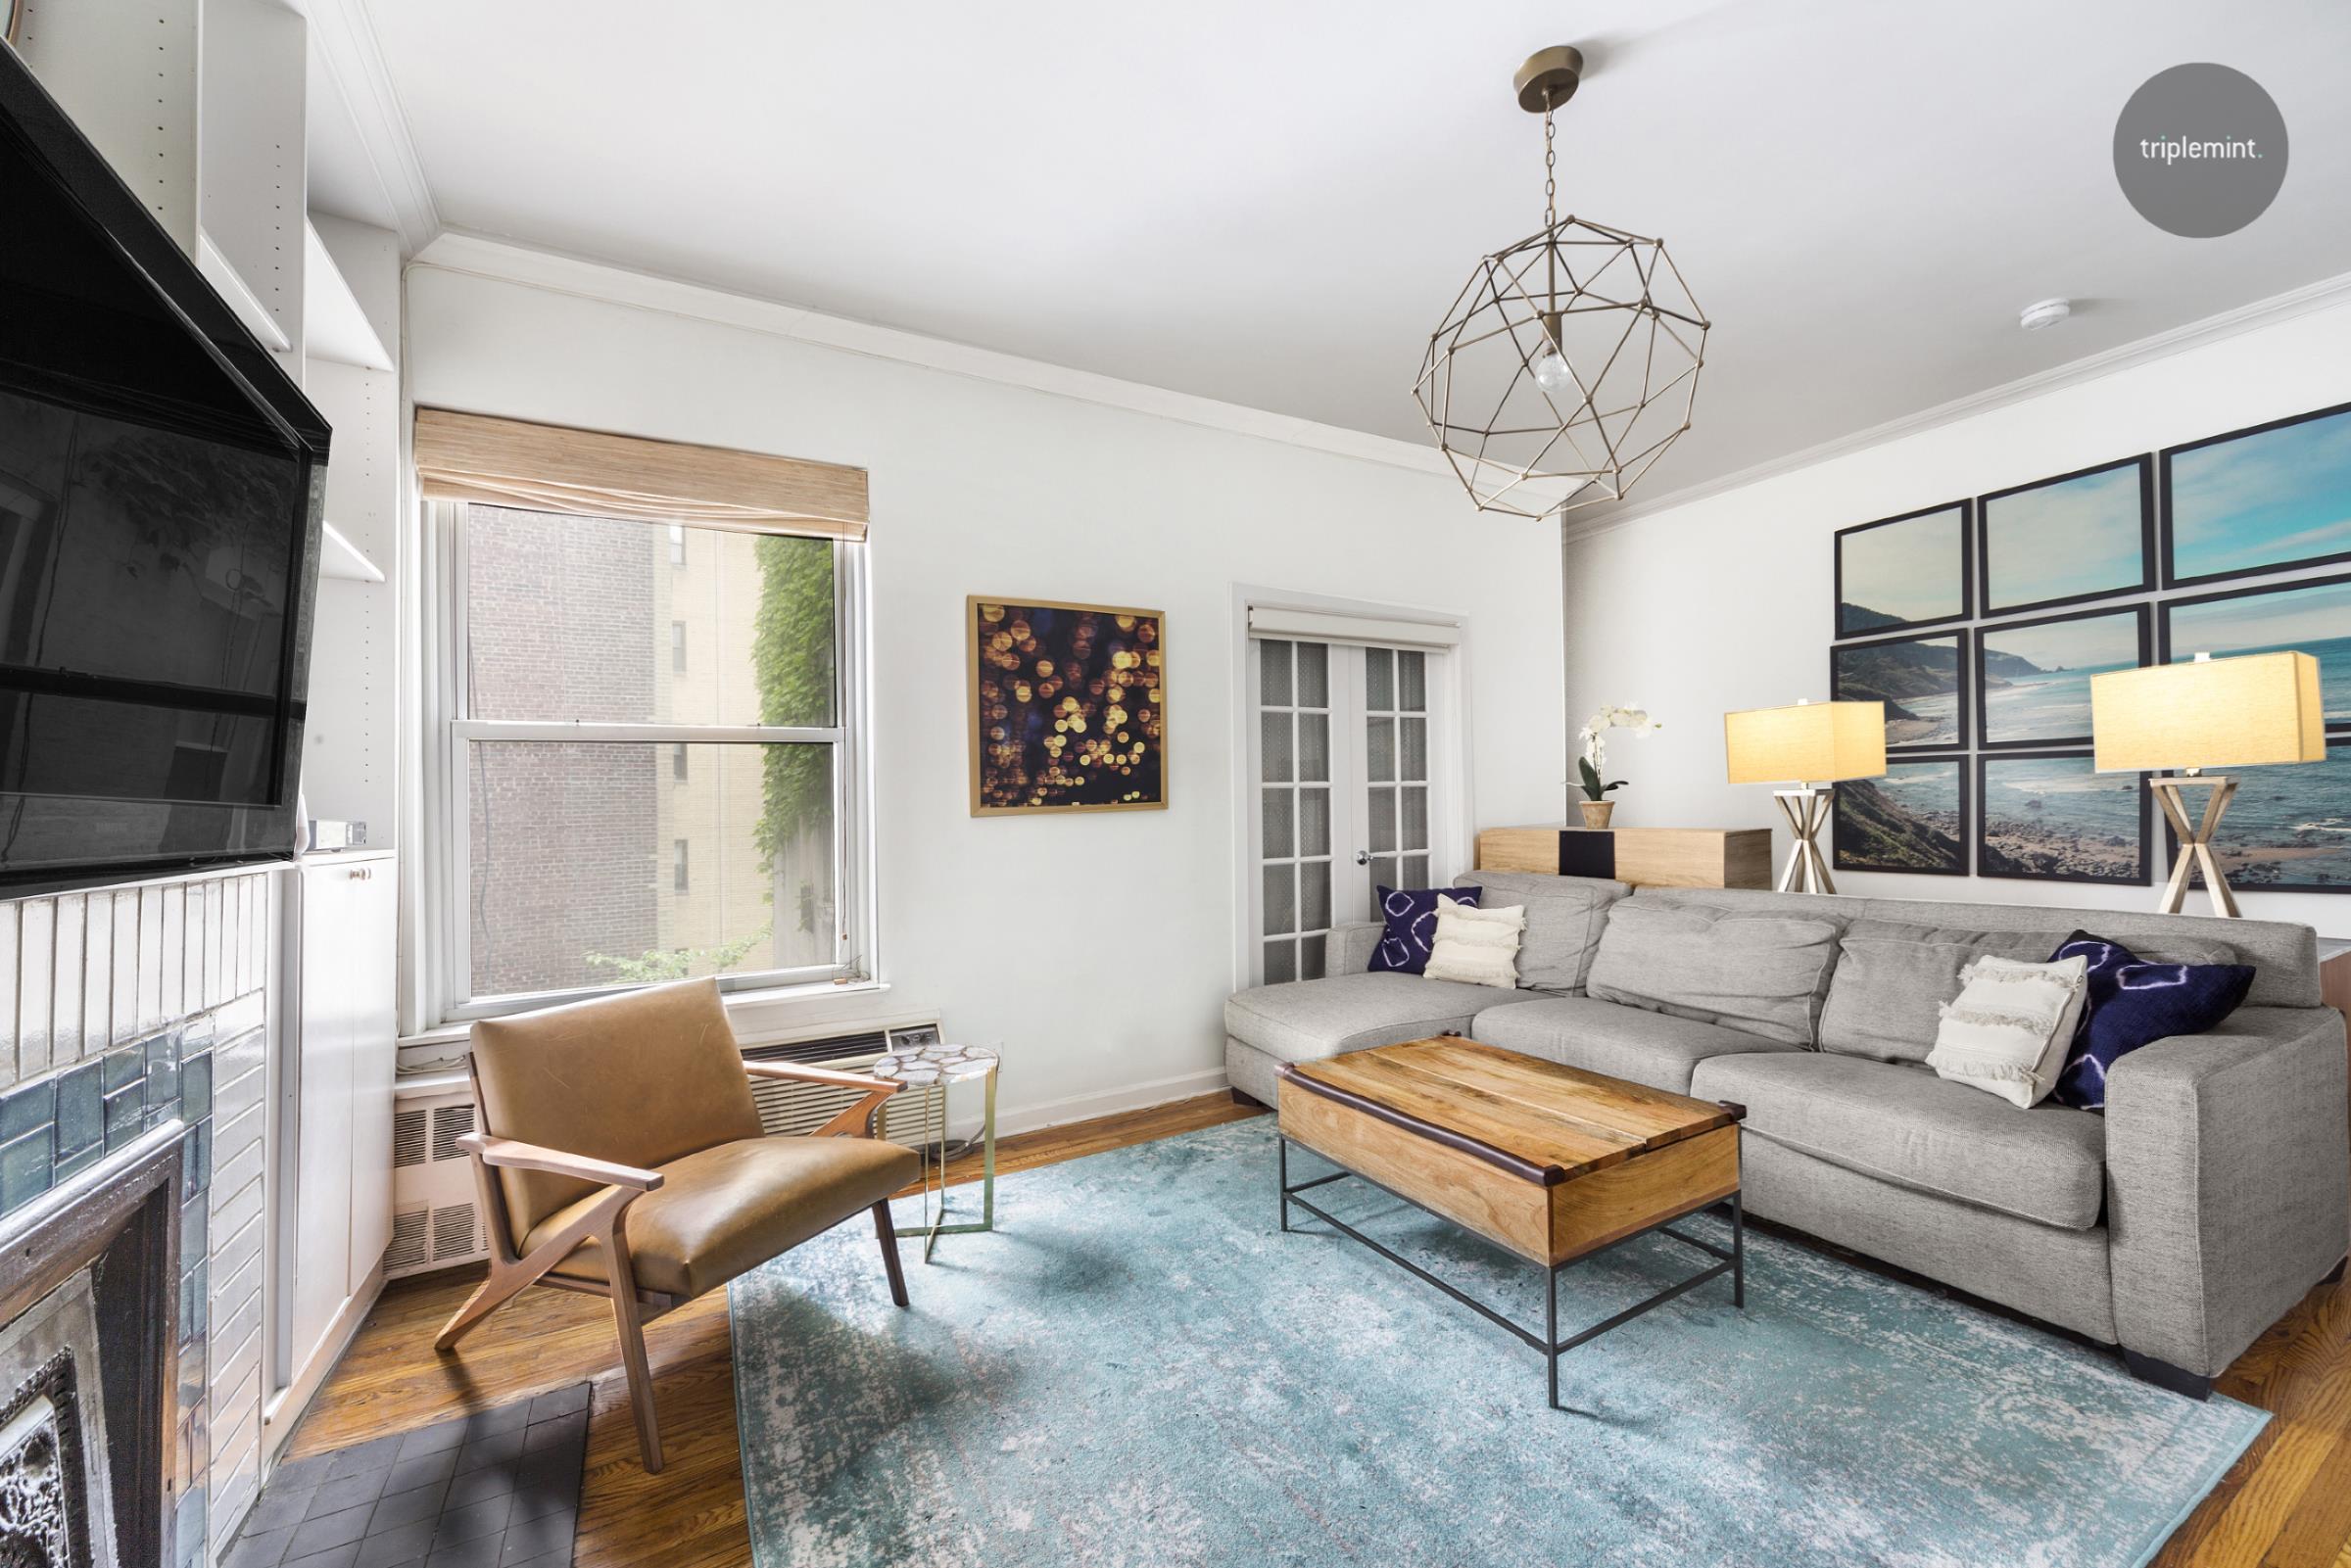 70 East 93rd Street 3-B Carnegie Hill New York NY 10128